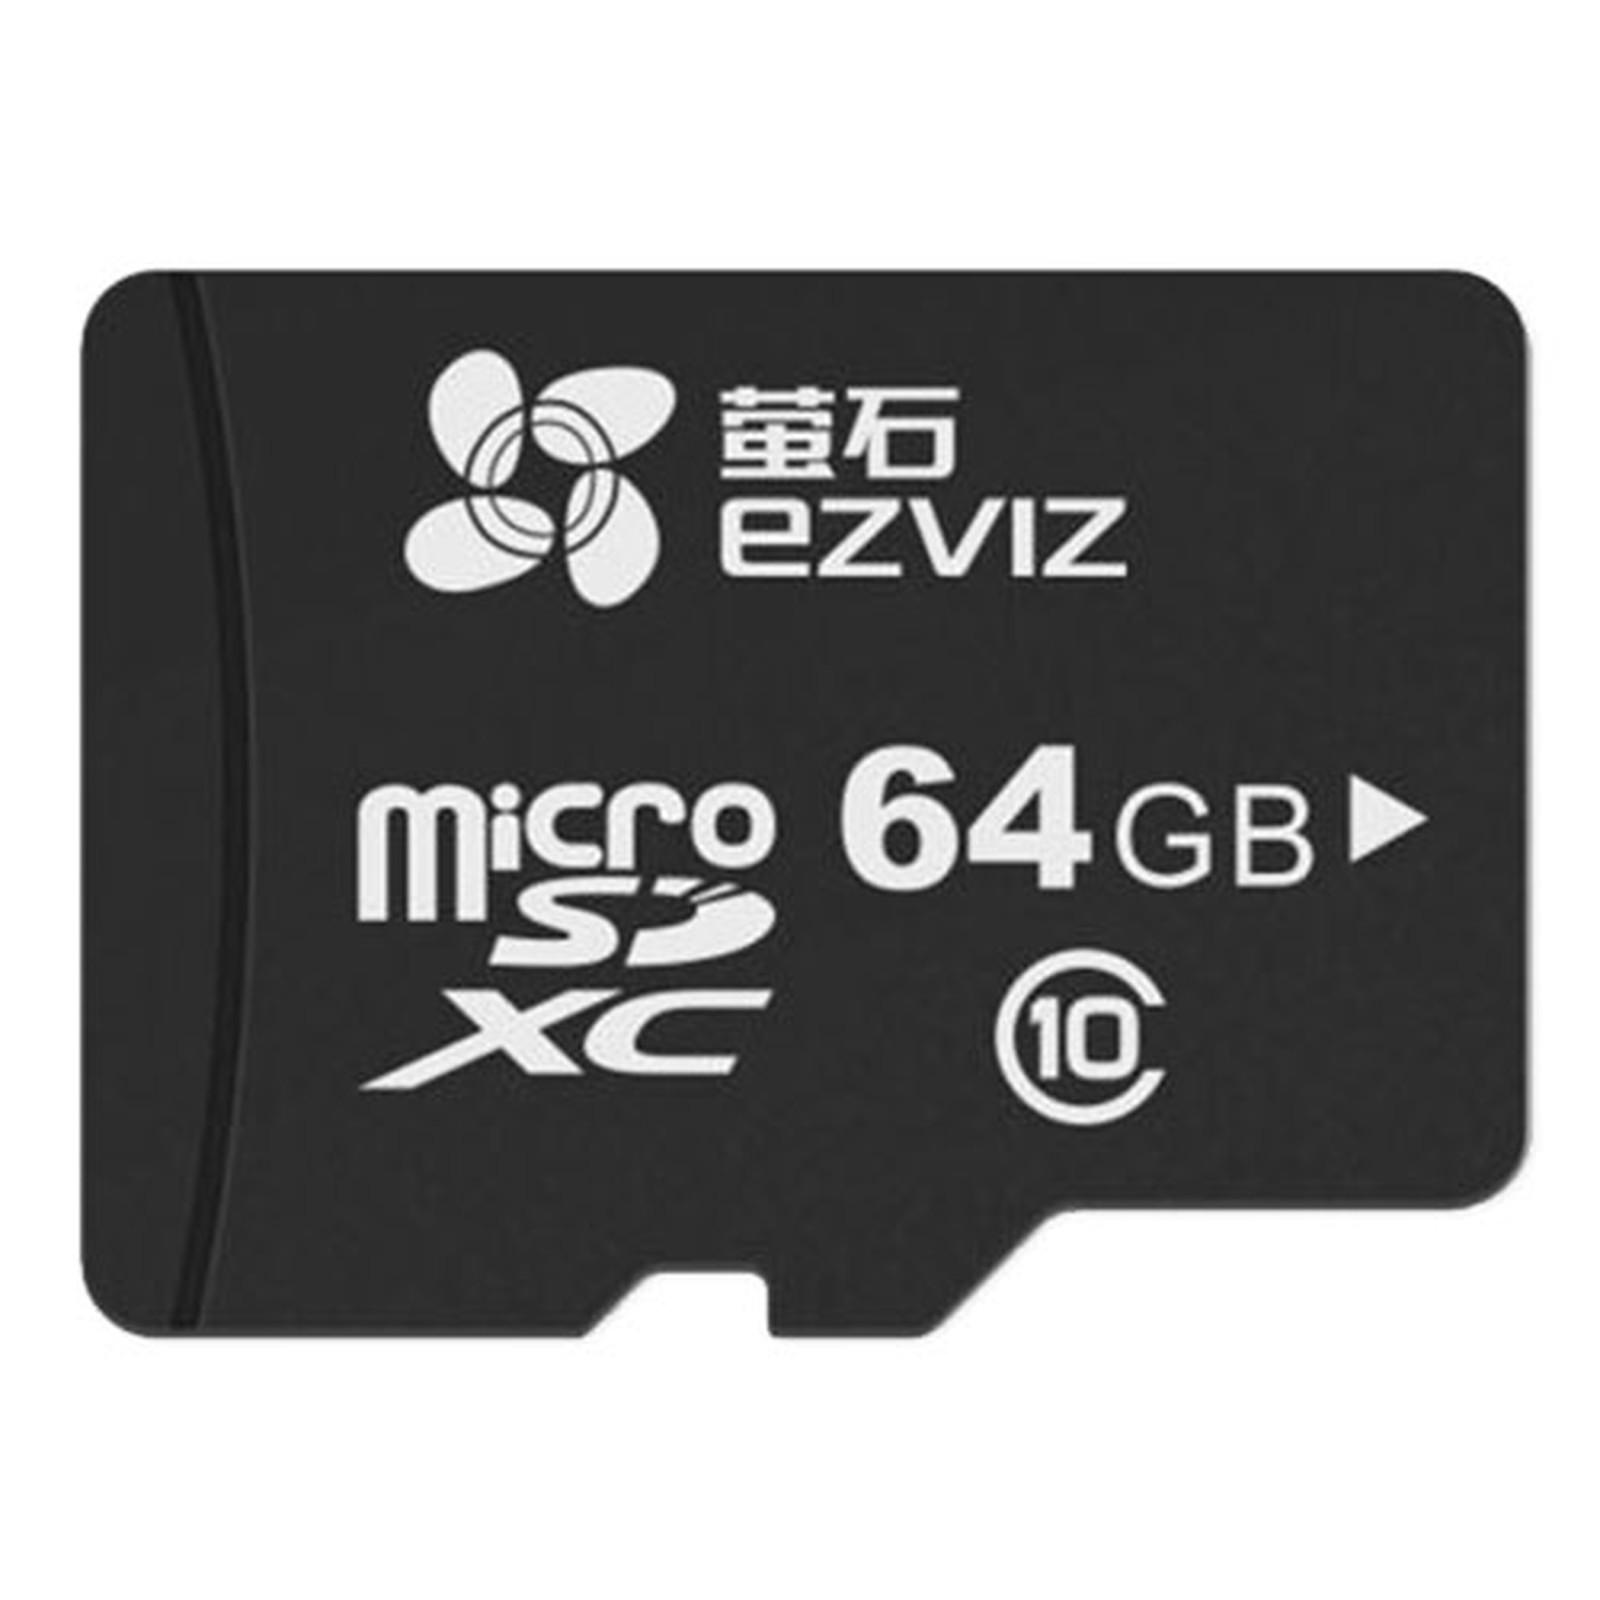 carte sdhc 64 go EZVIZ Carte Micro SDHC 64 Go   Carte mémoire EZVIZ sur LDLC.com